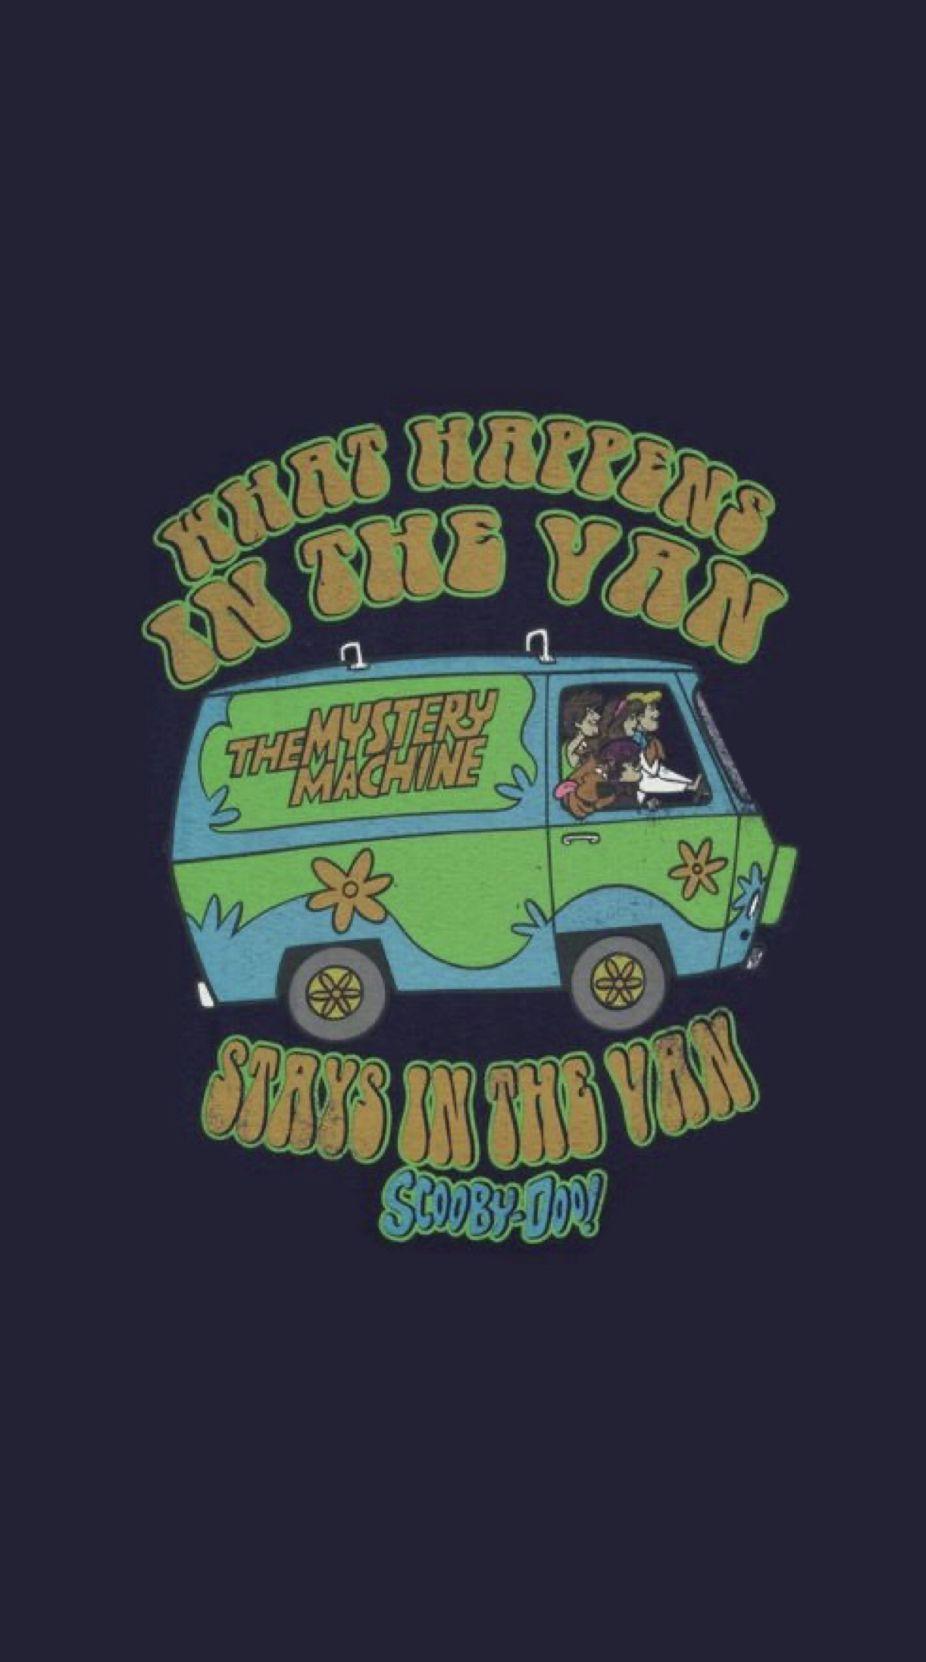 Hippy Font Scooby Doo Wallpaper In 2020 Hippie Font Scooby Doo Illustration Design